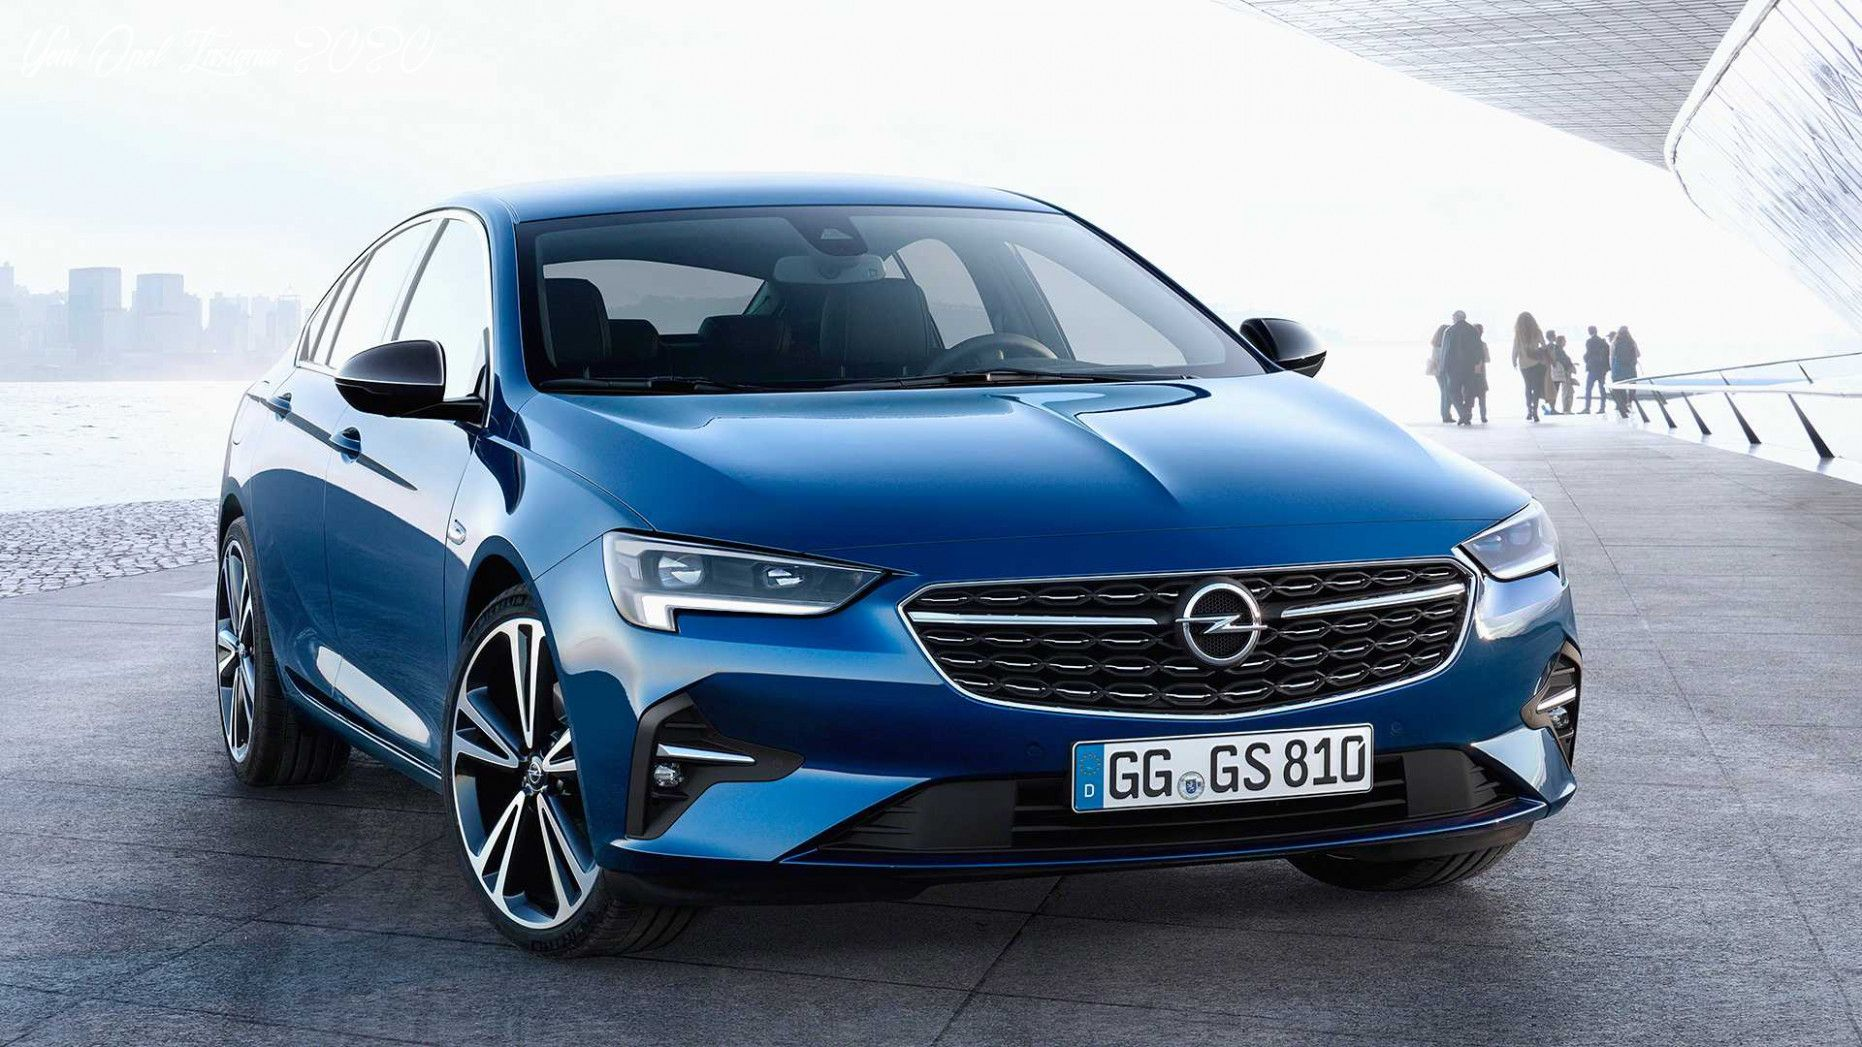 Yeni Opel Insignia 2020 Specs In 2020 Car Wallpapers Vauxhall Insignia Opel